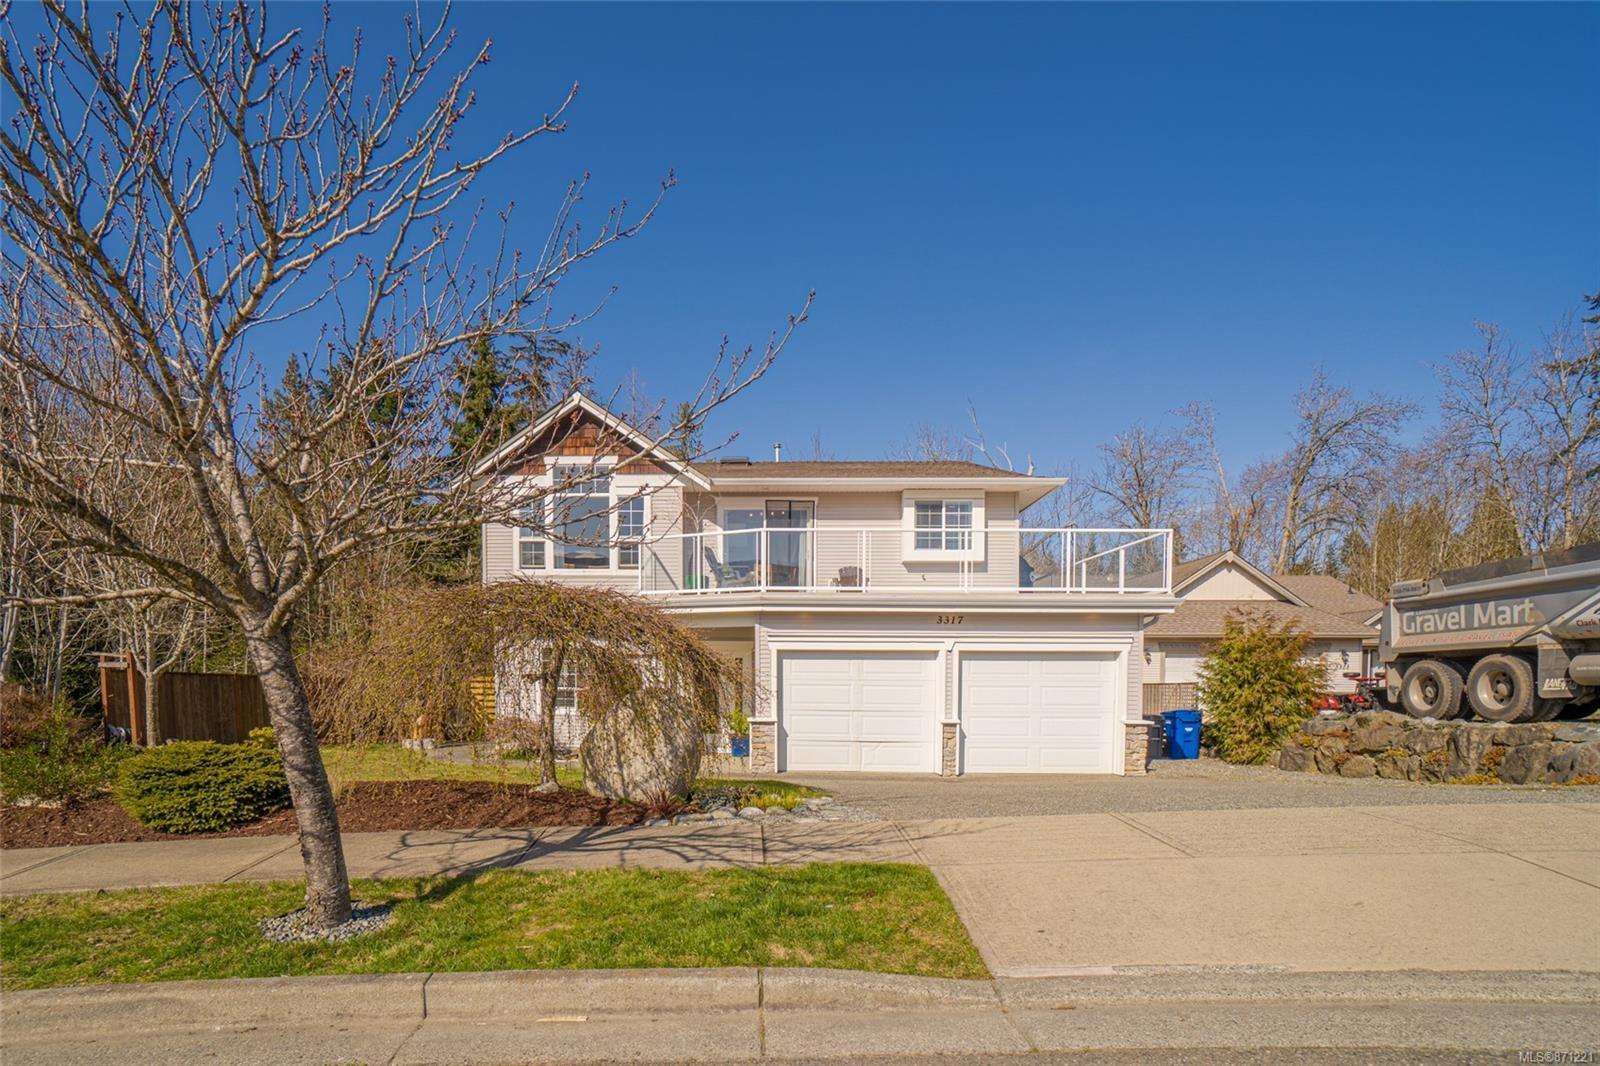 Main Photo: 3317 Willowmere Cres in : Na North Jingle Pot House for sale (Nanaimo)  : MLS®# 871221